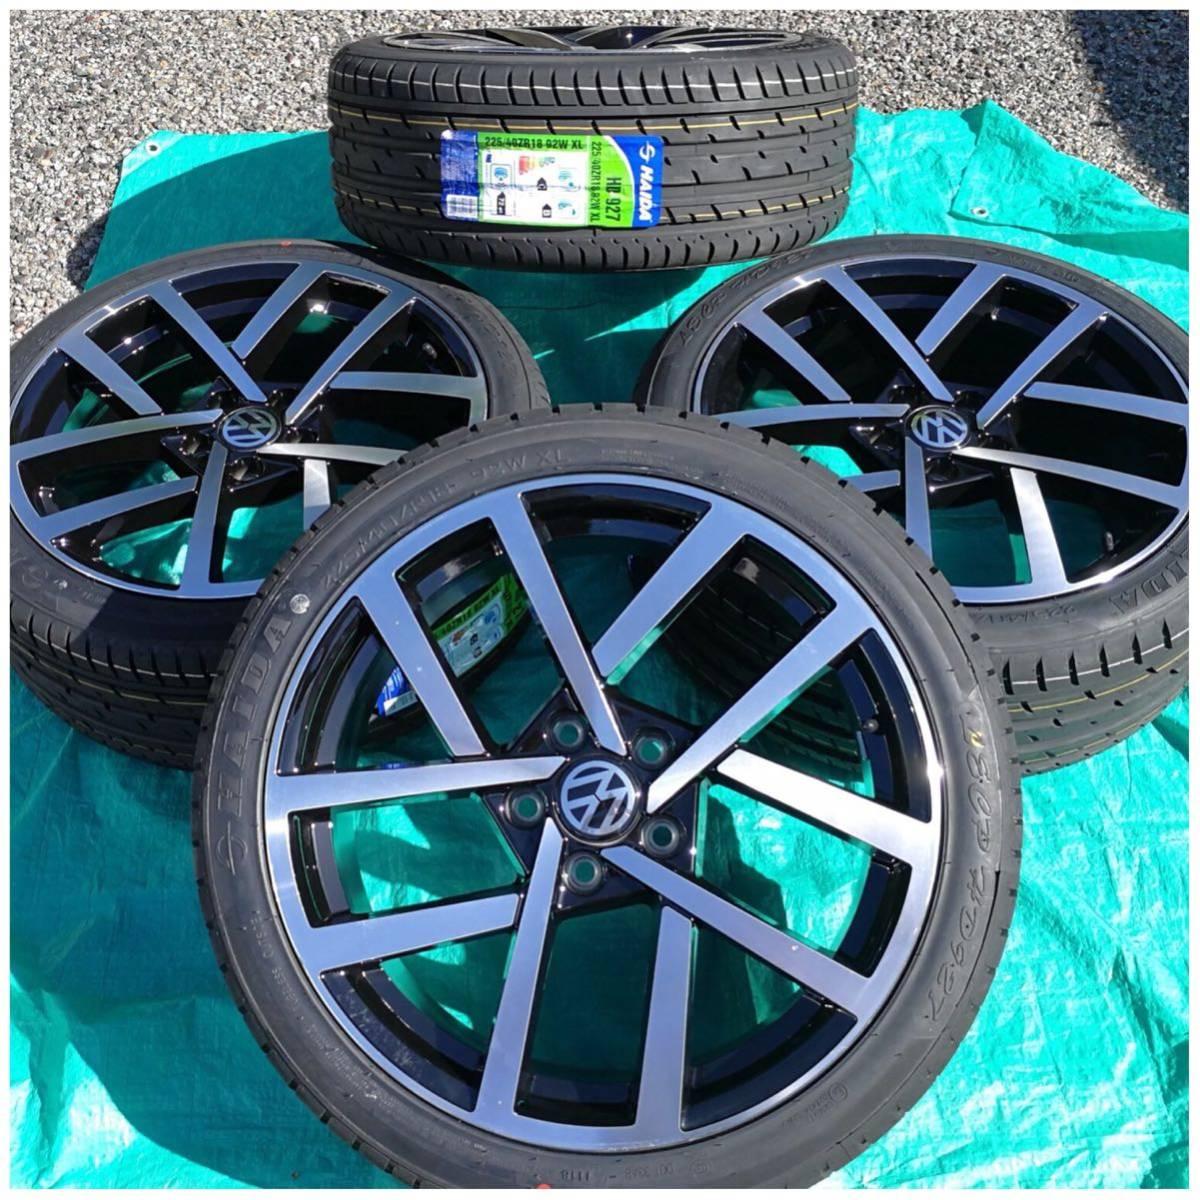 VW ワーゲン ゴルフ5 ゴルフ6 ゴルフ7 18インチ 新品 225/40R18 4本 タイヤセット品_画像4